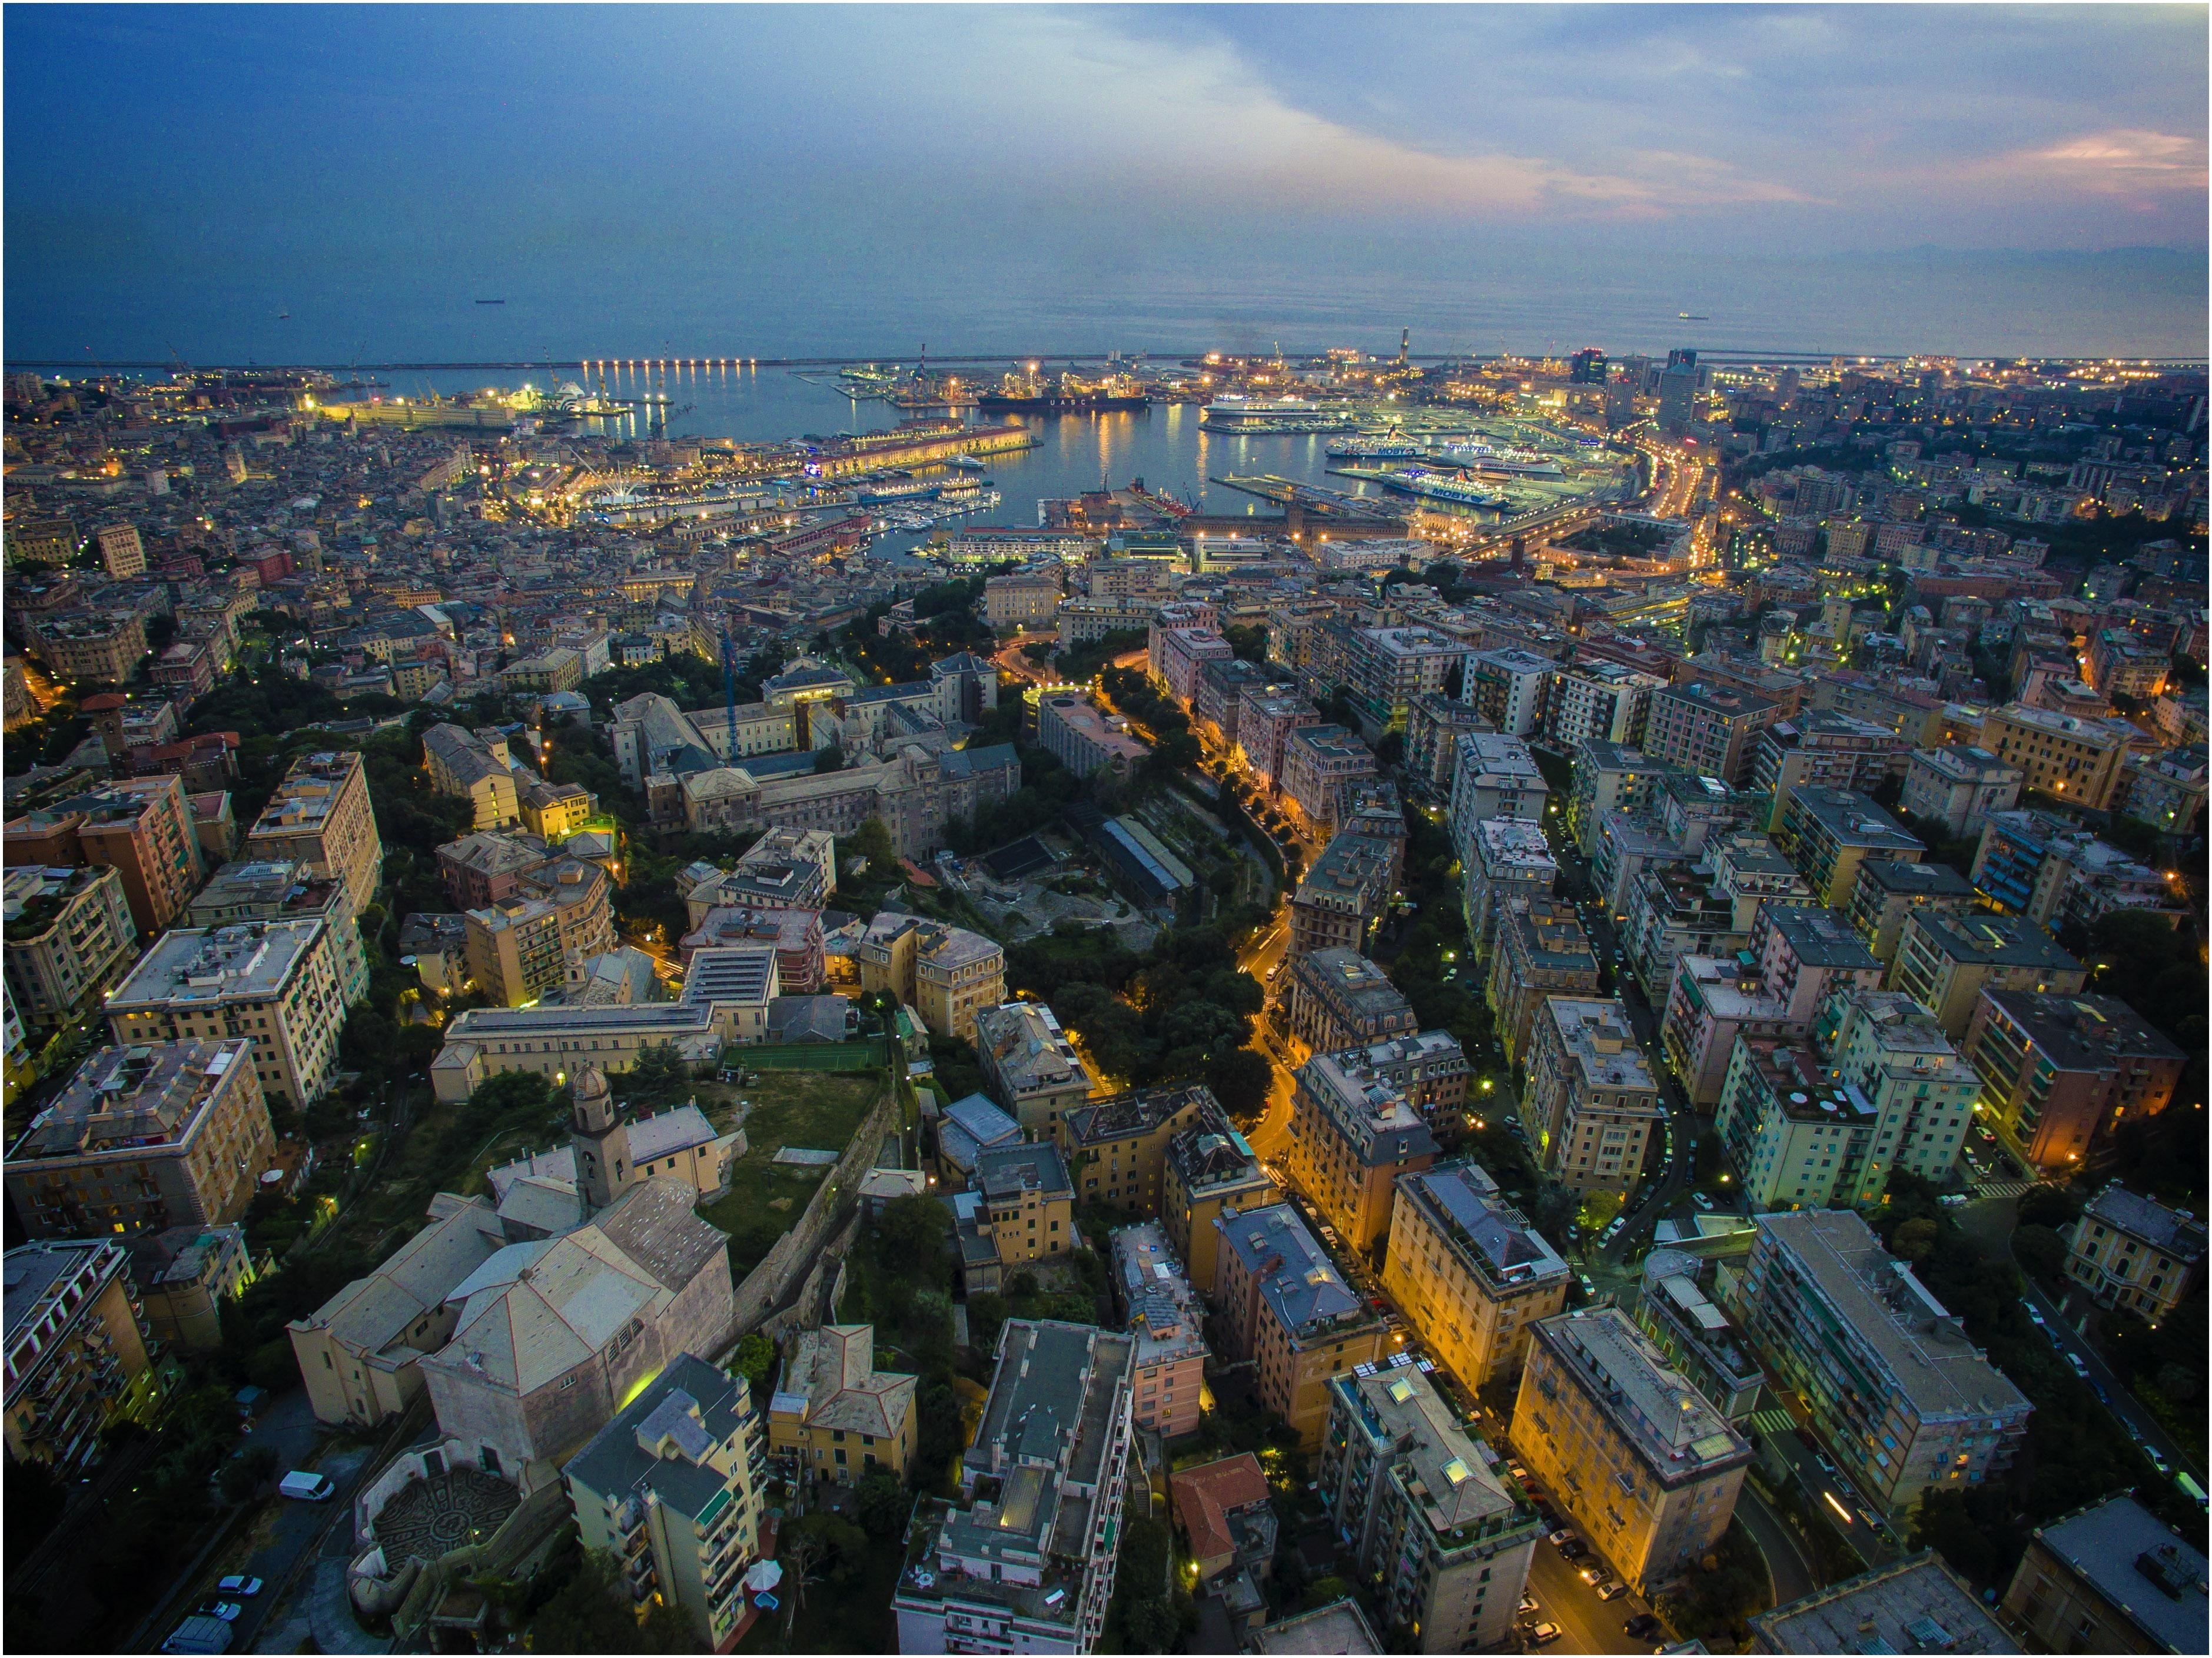 Beachfront Hotels In Genoa Italy Inspirational top 10 Hotels In Genoa Italy